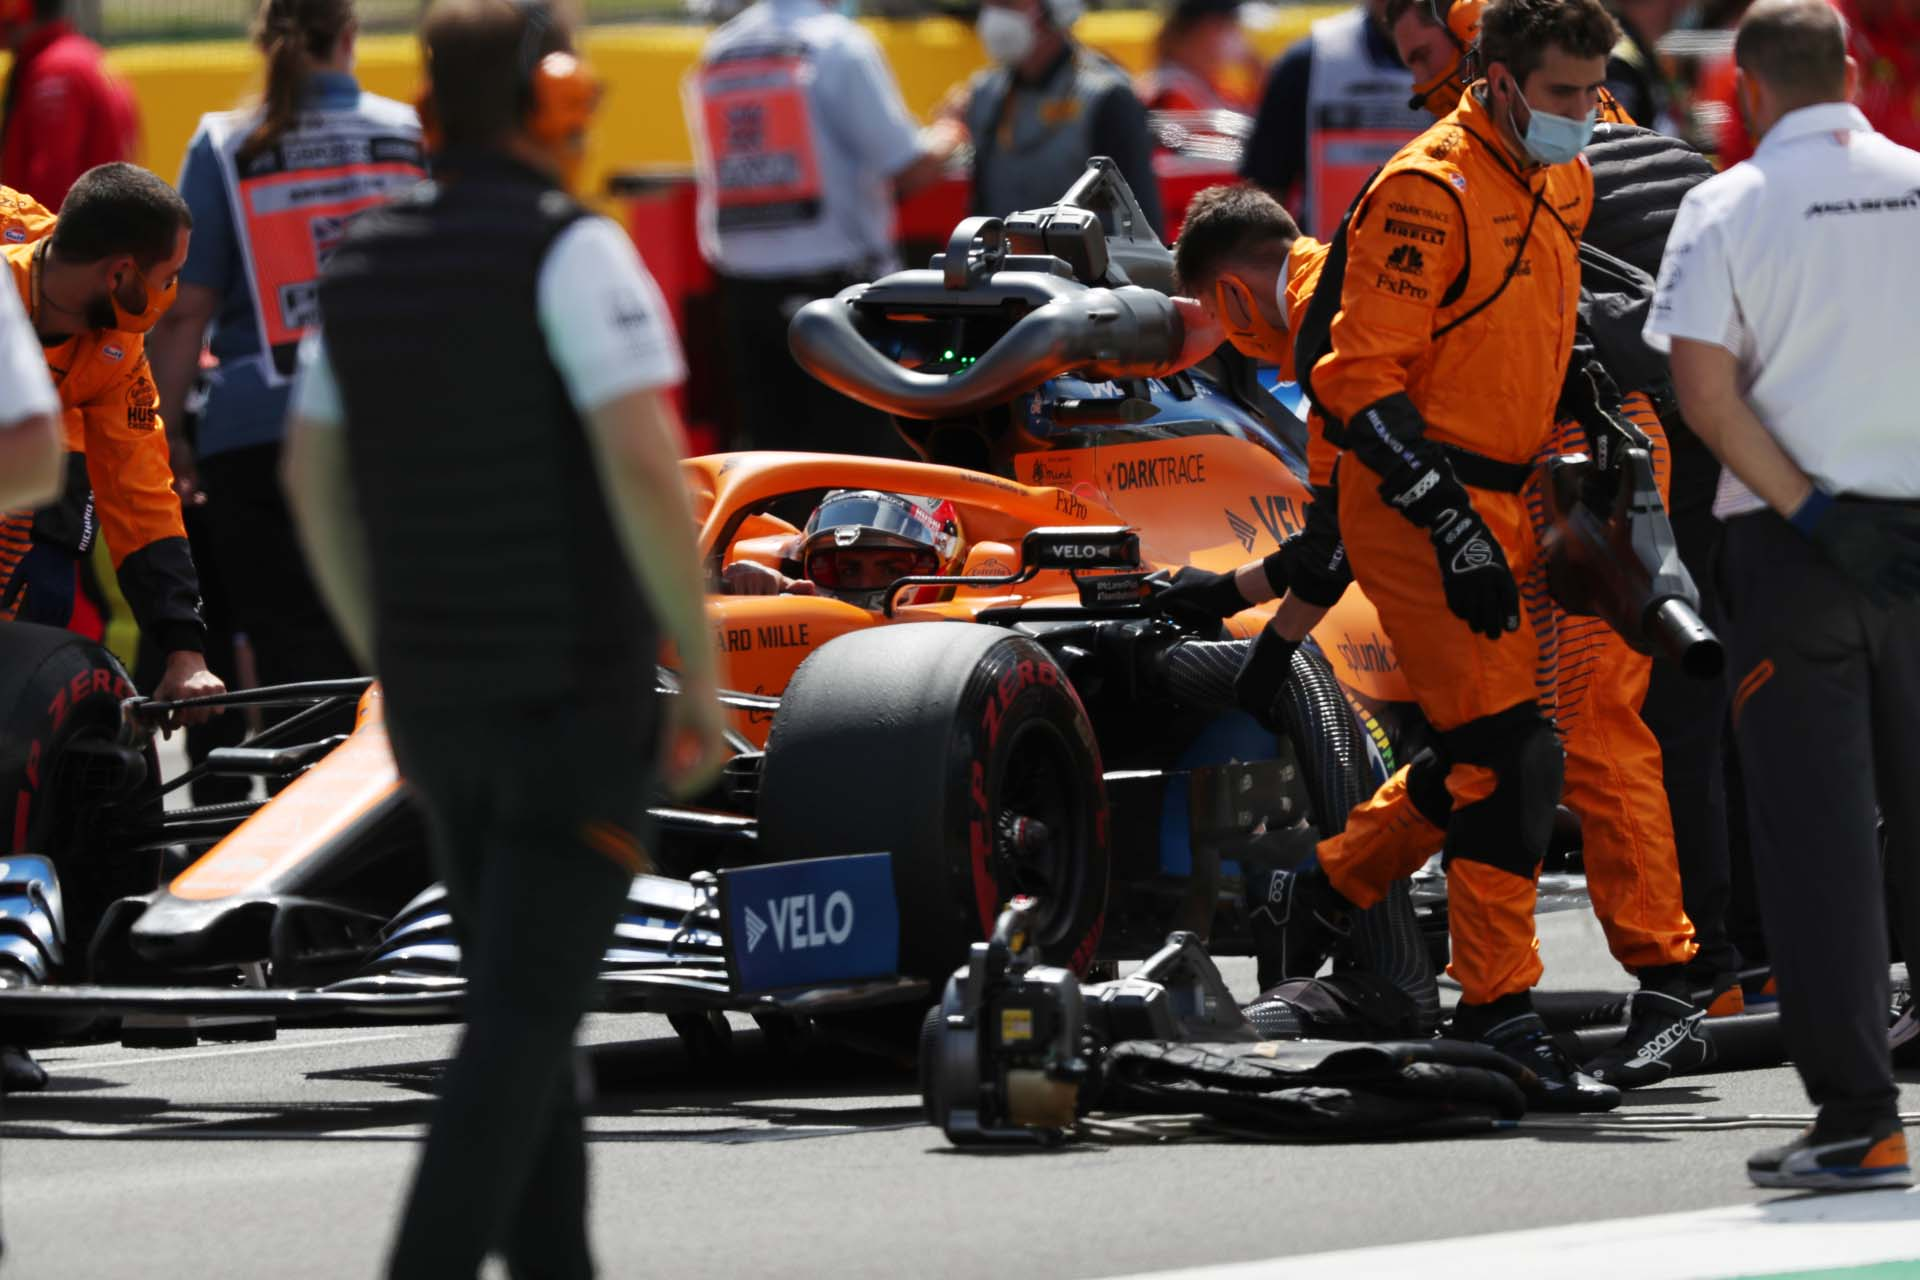 Carlos Sainz, McLaren MCL35, on the grid with his mechanics